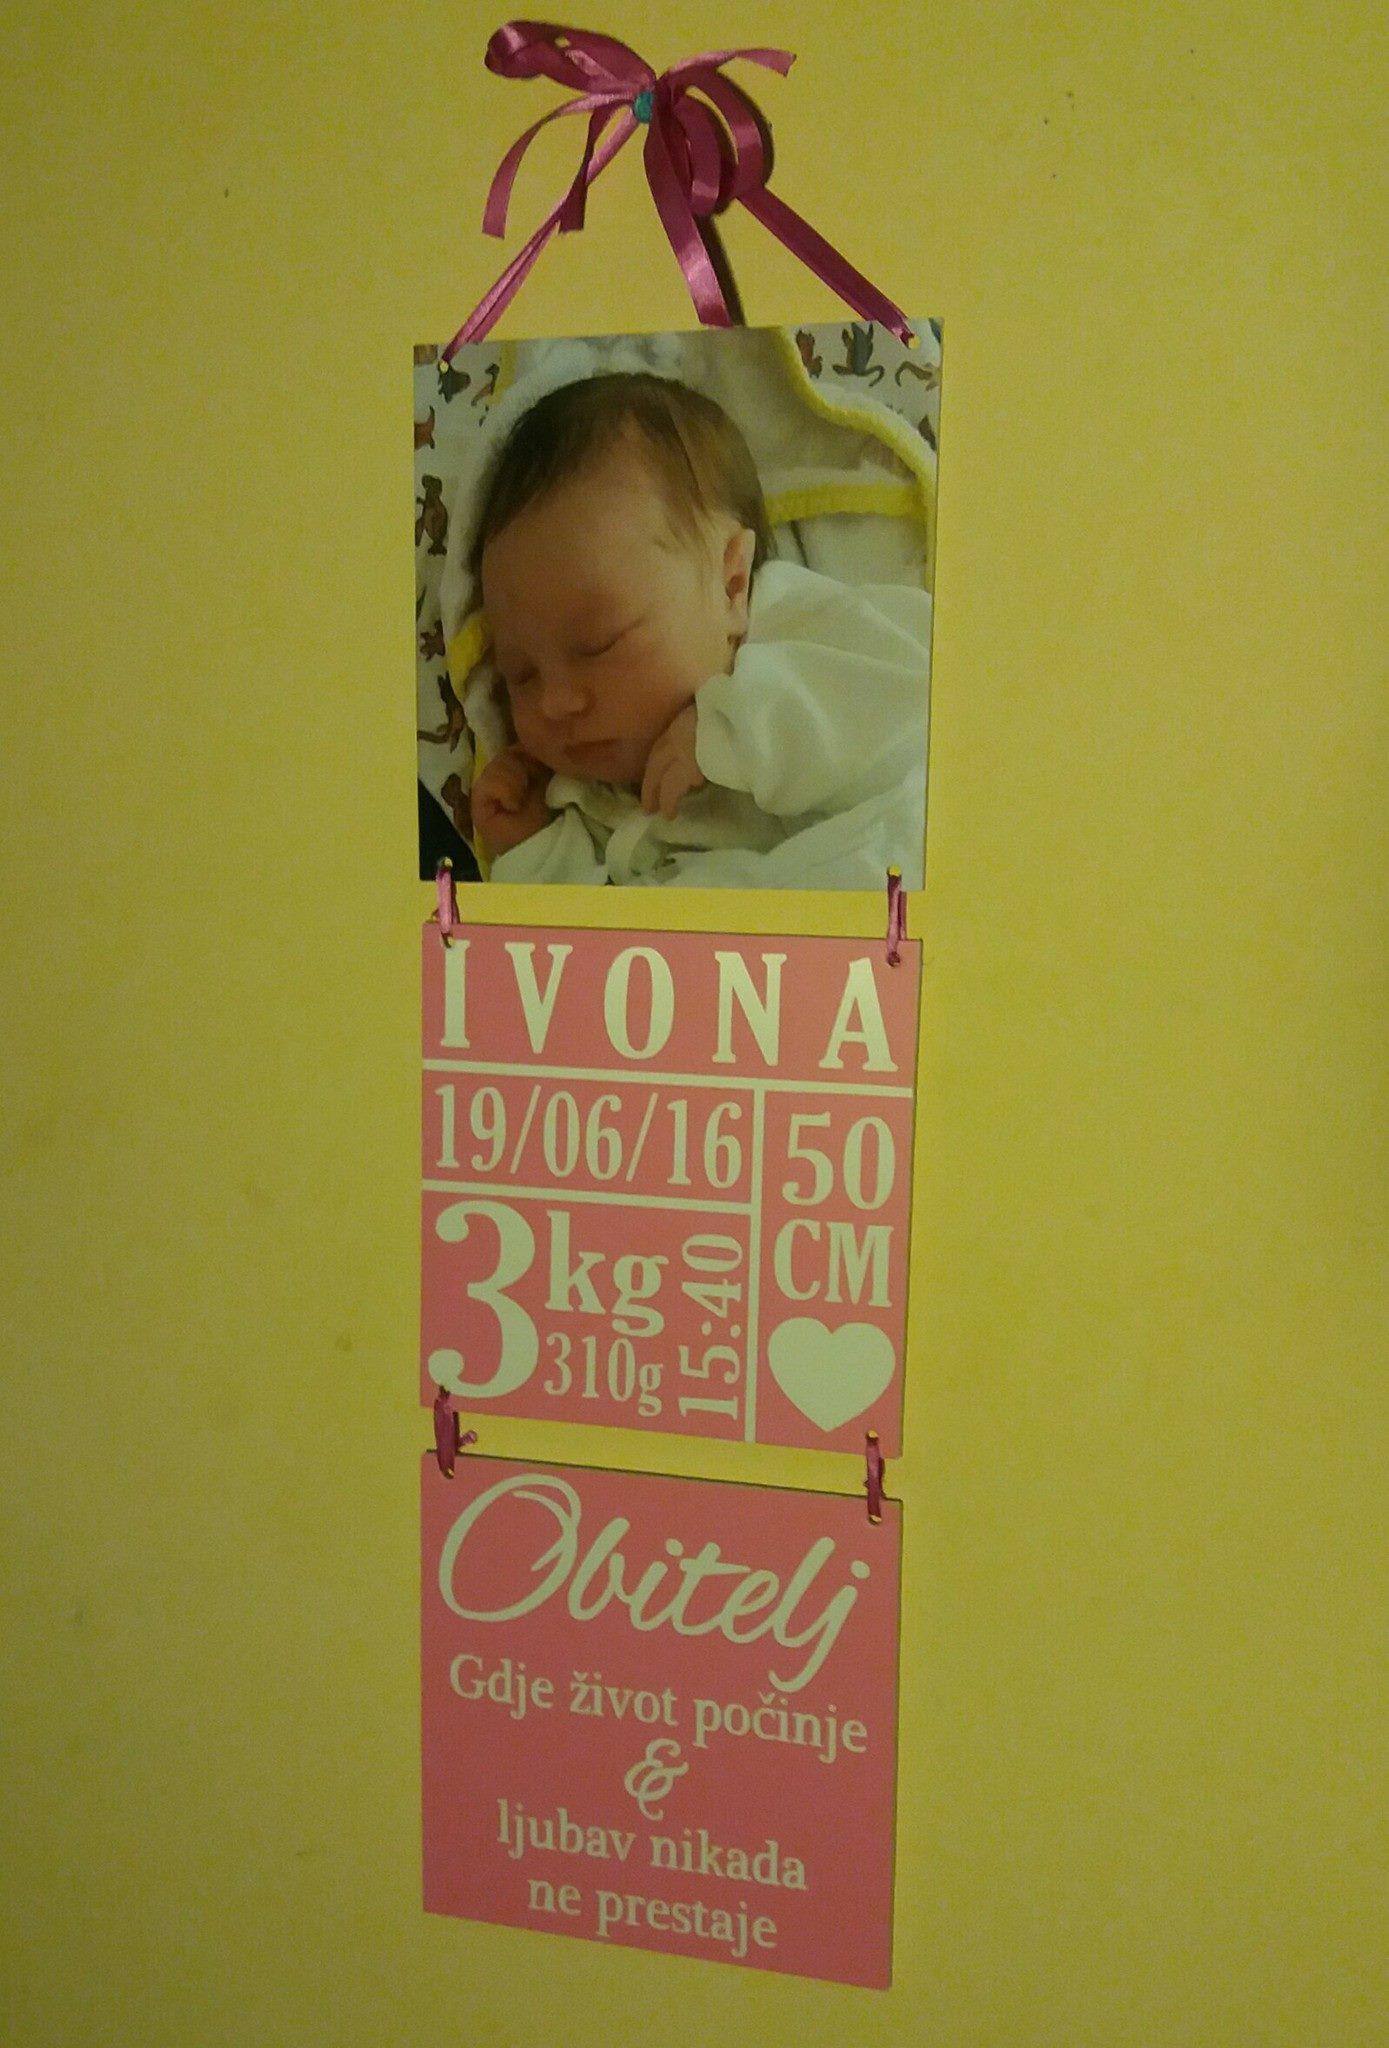 Idealan poklon za rođenje djeteta  MojStan.net